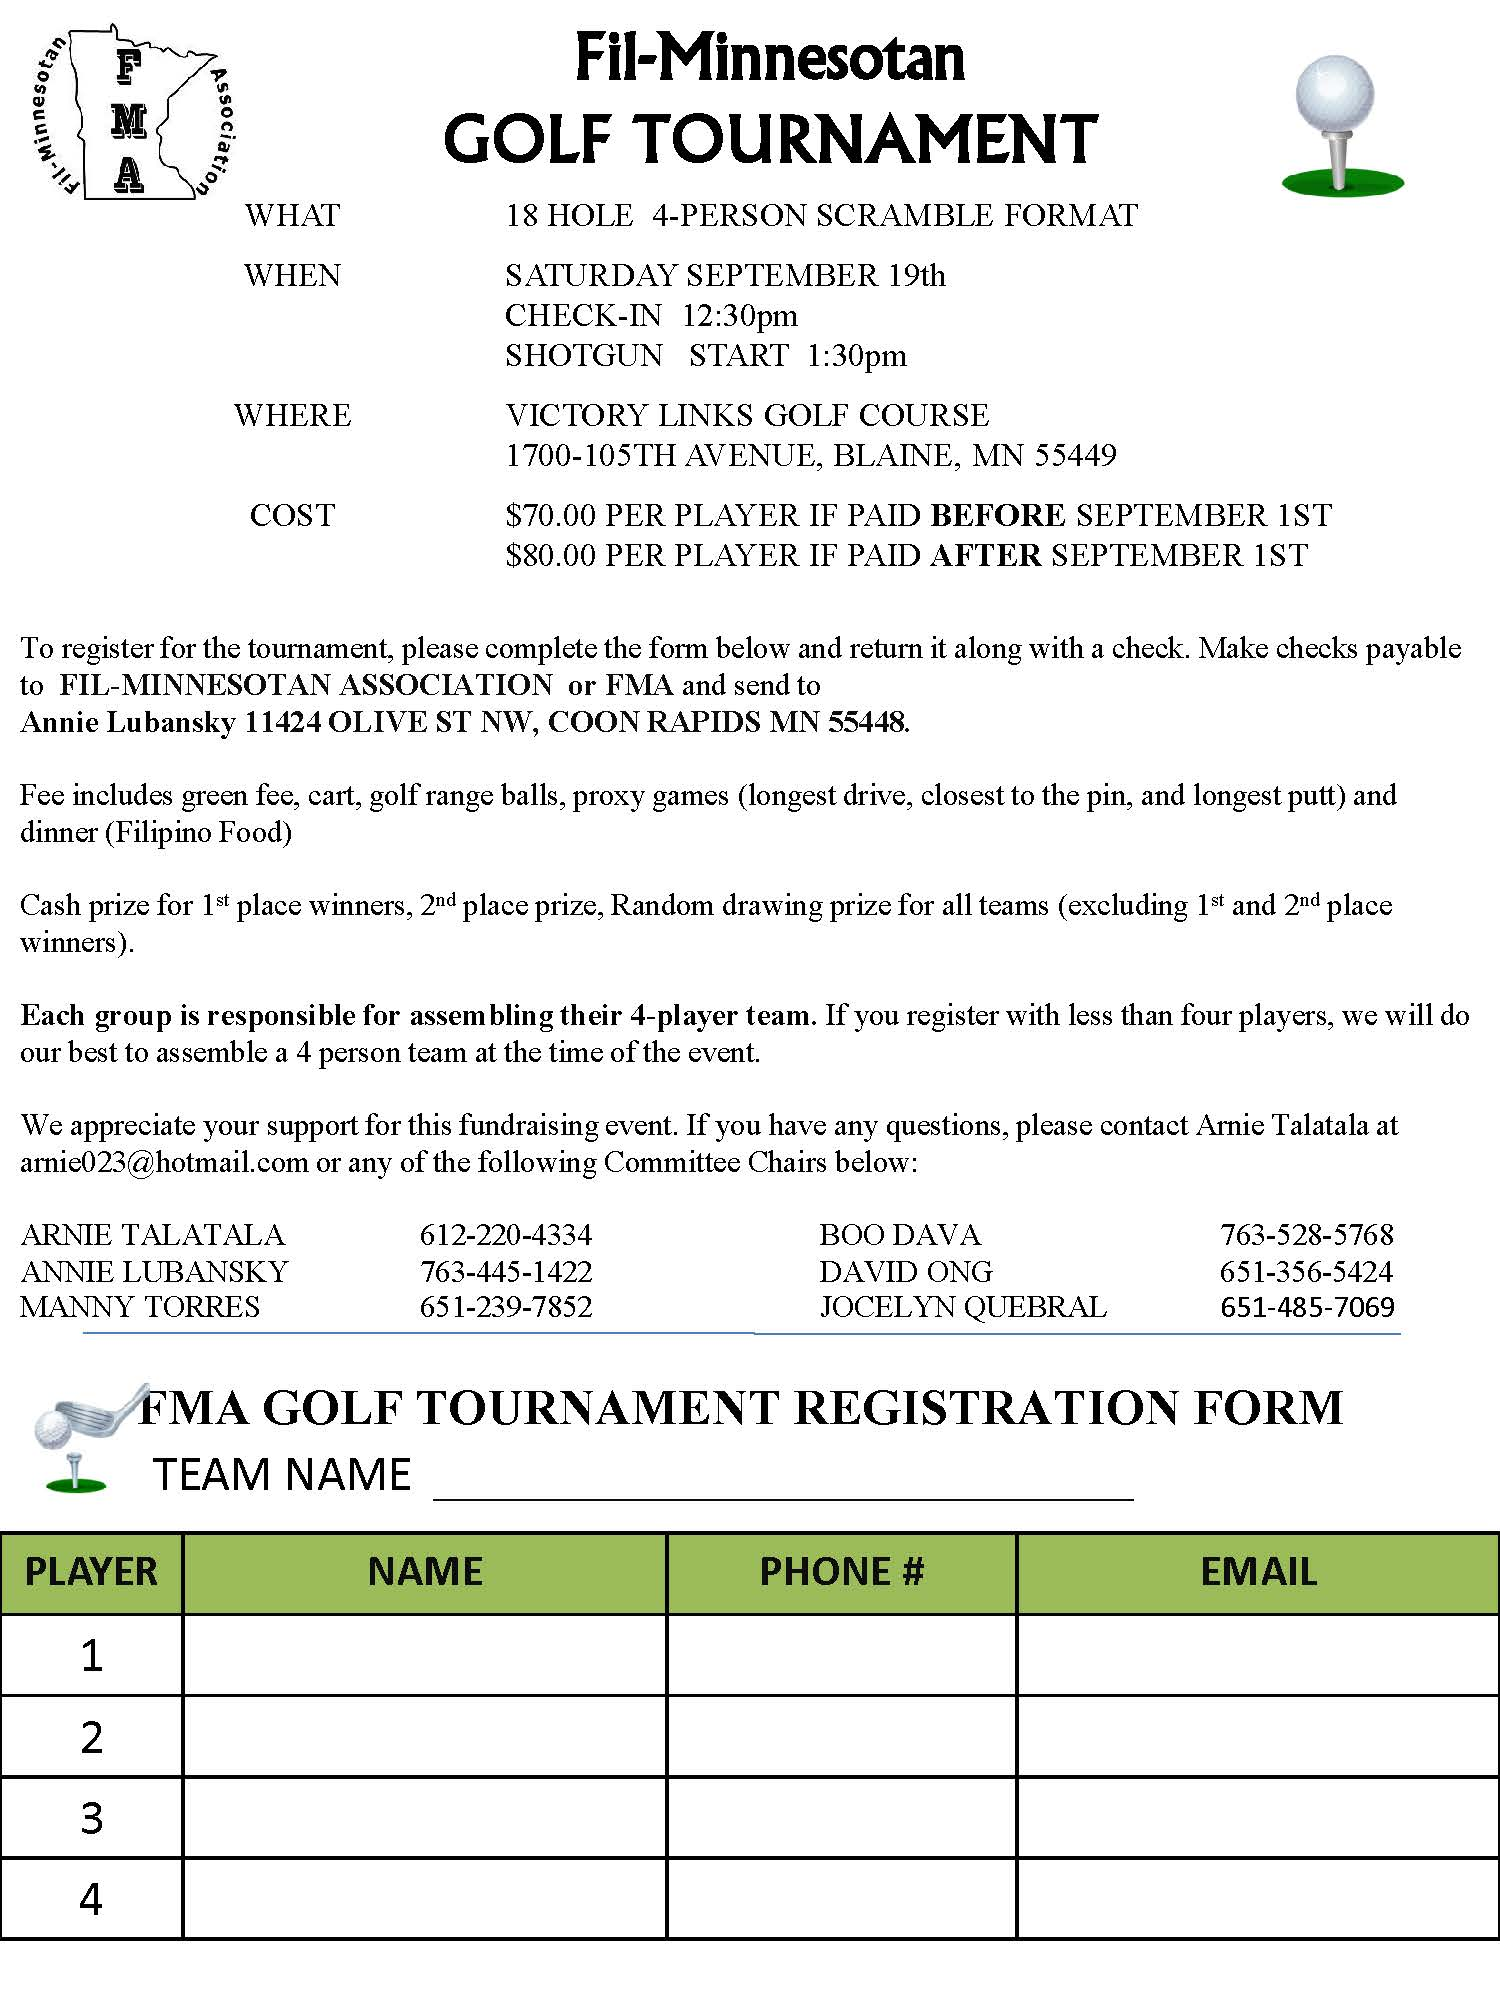 FMA Golf Tournament.png